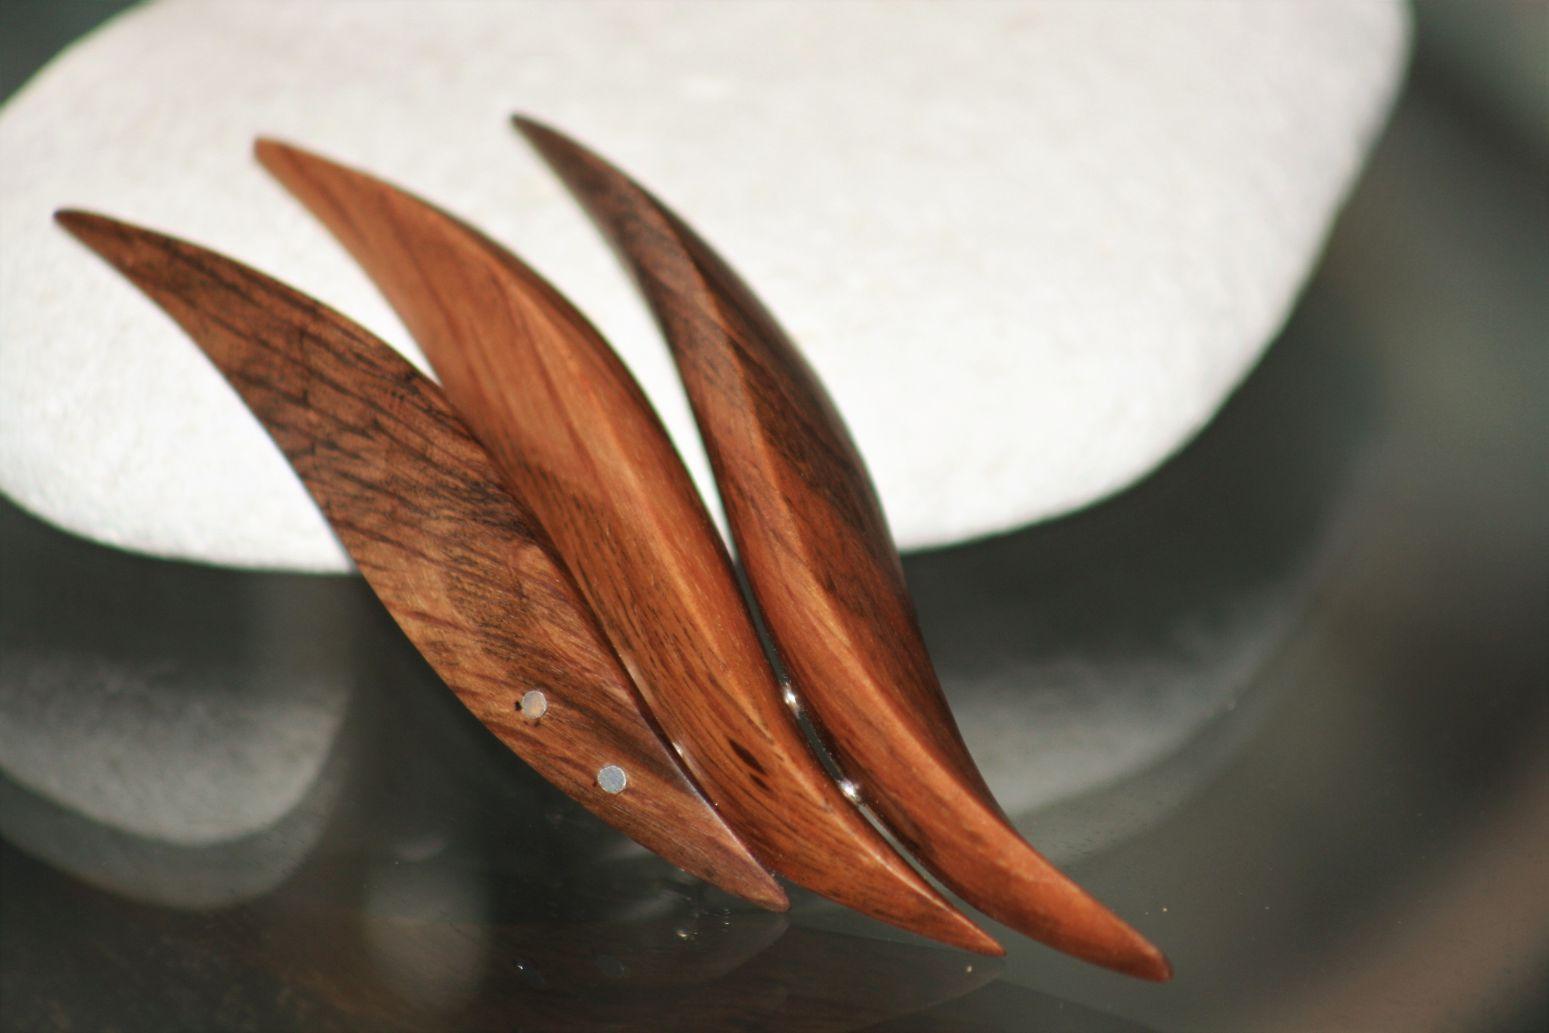 wooden brooches jewellery Marina Mediterranean holm oak wood unique handmade sanisio artist design black oak jewelry